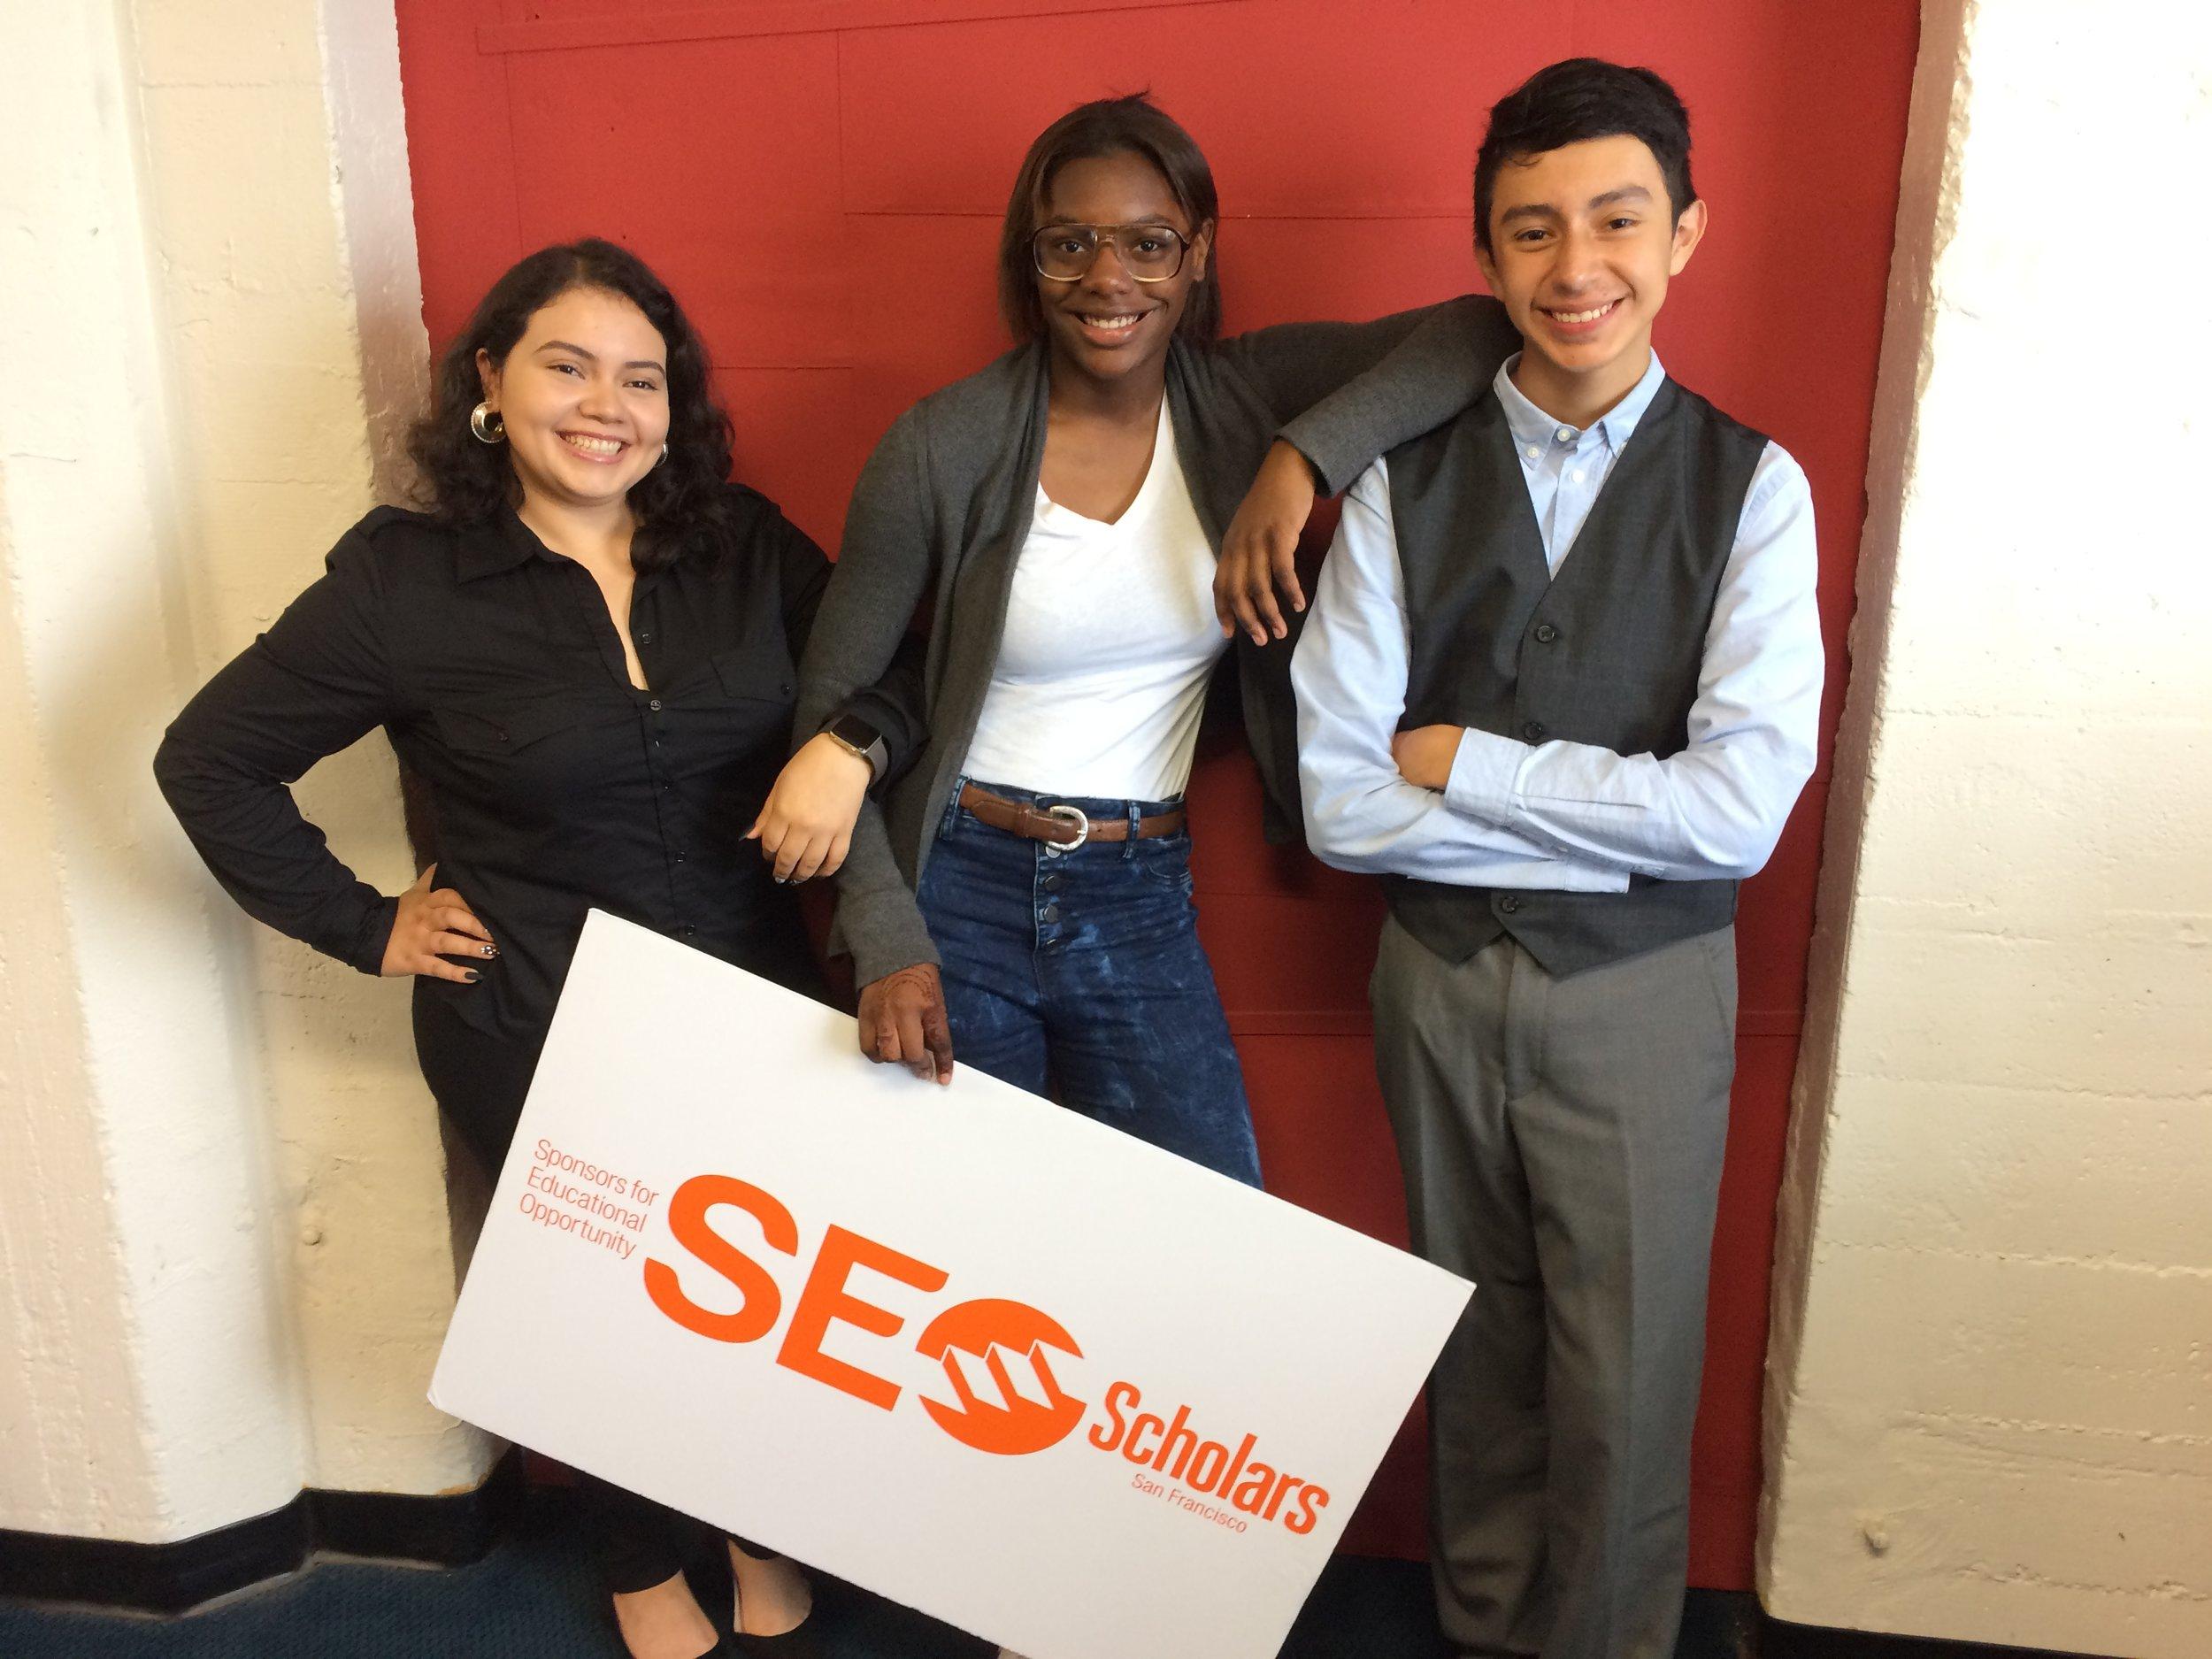 SEO Scholars (l to r) Iris Bonilla, 20, Kamiah Brown, 16, David Ruiz, 15